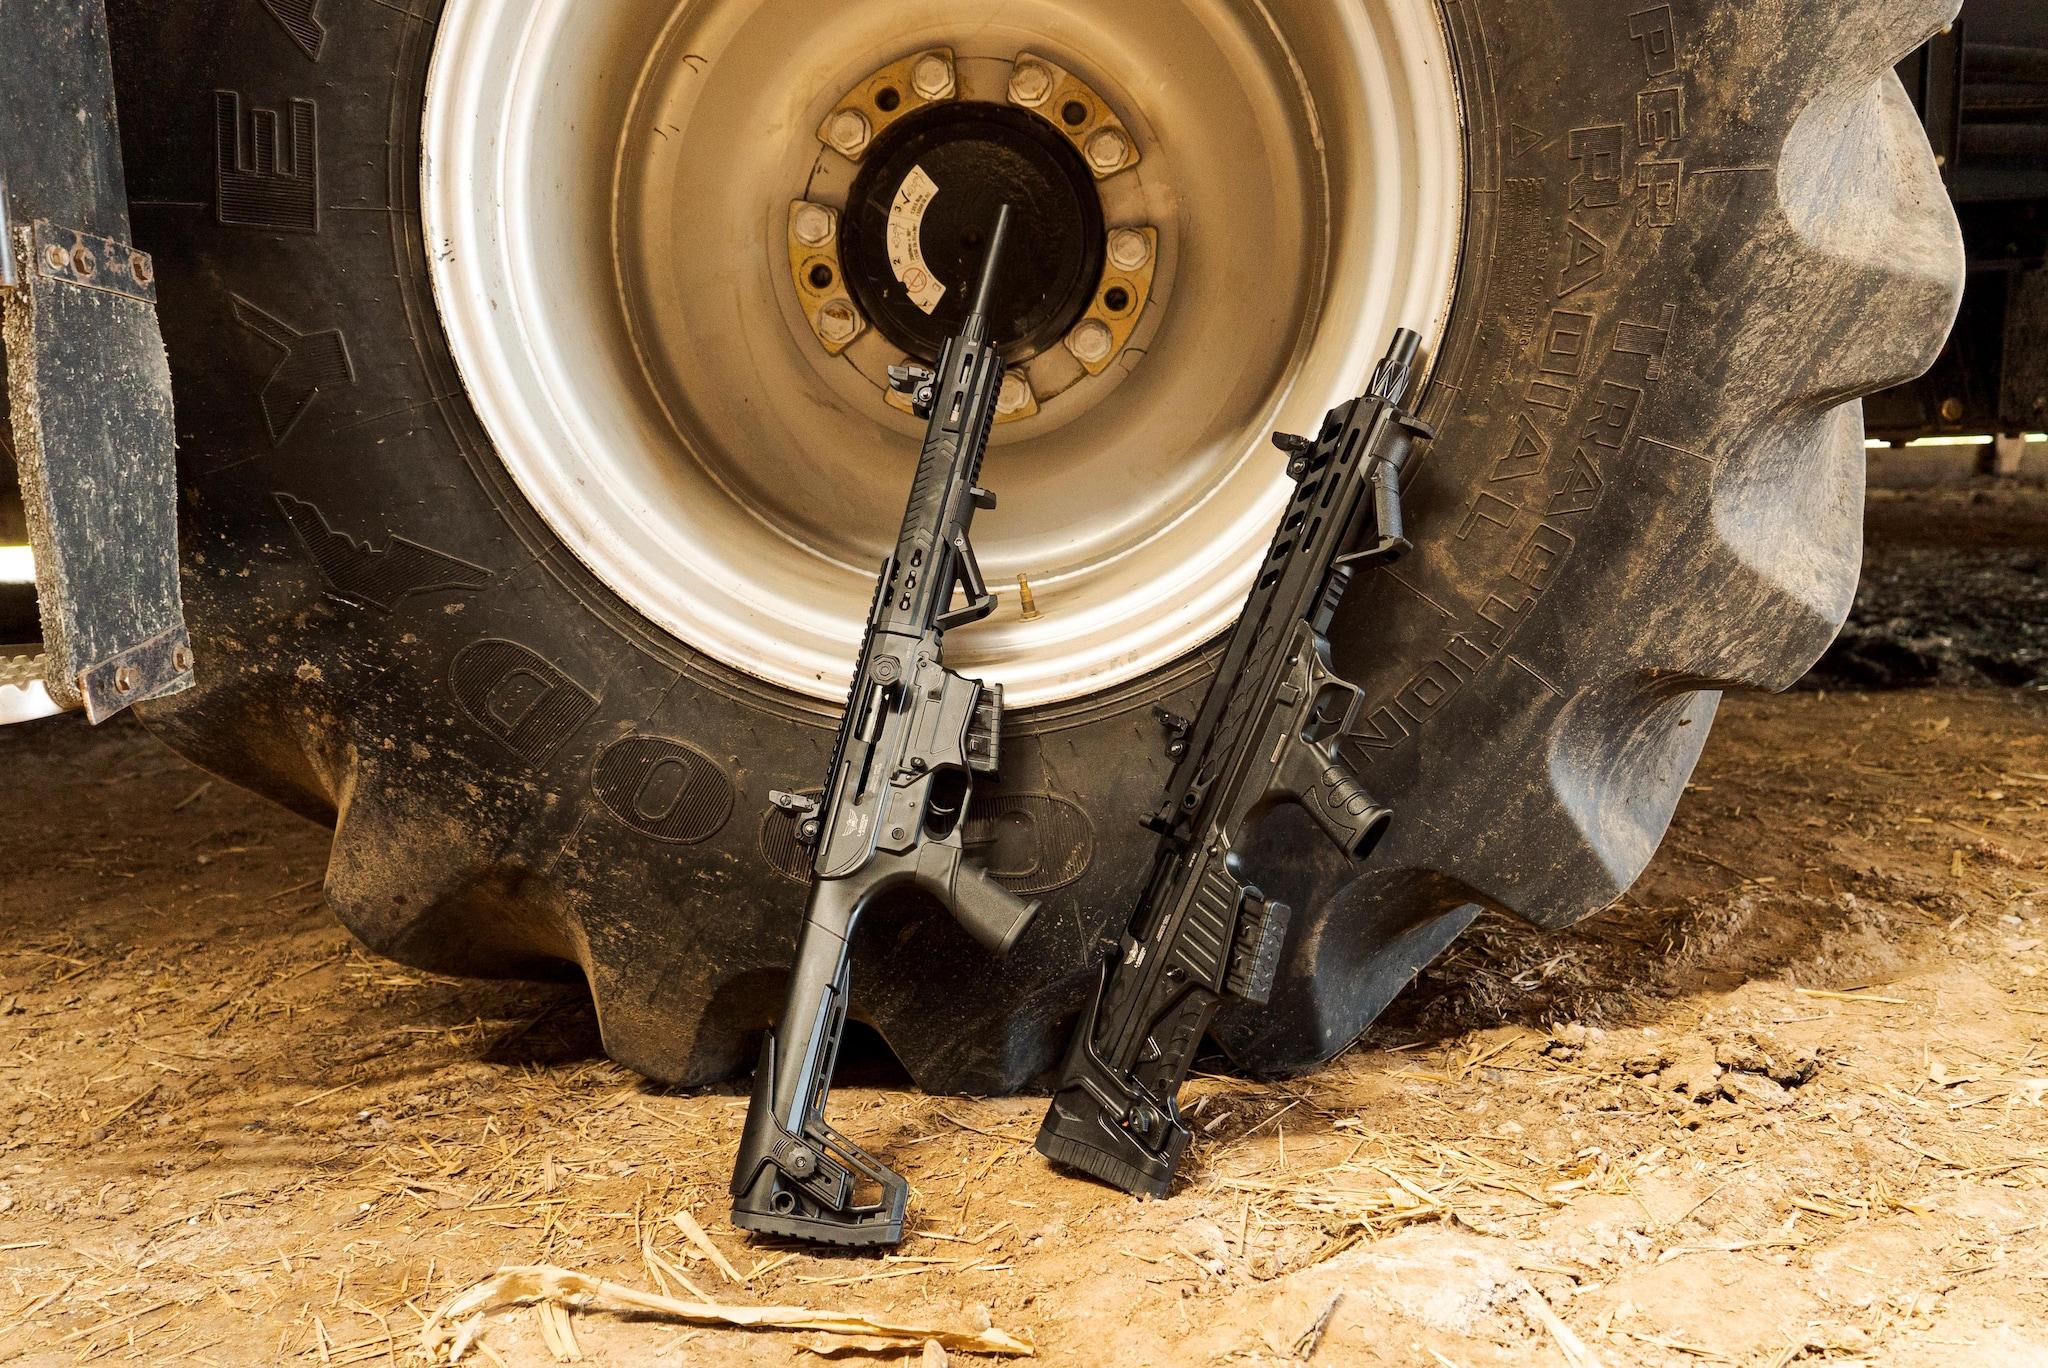 ar-12 shotguns next to large tire